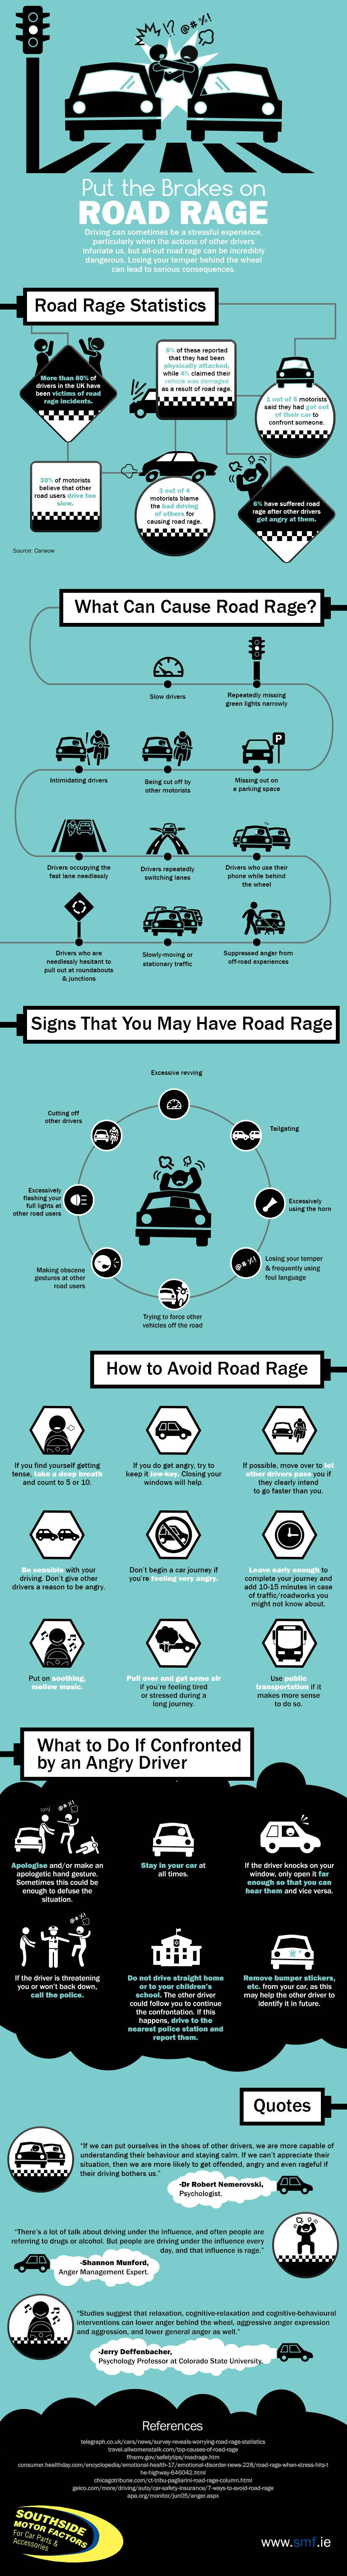 road-rage-infographic